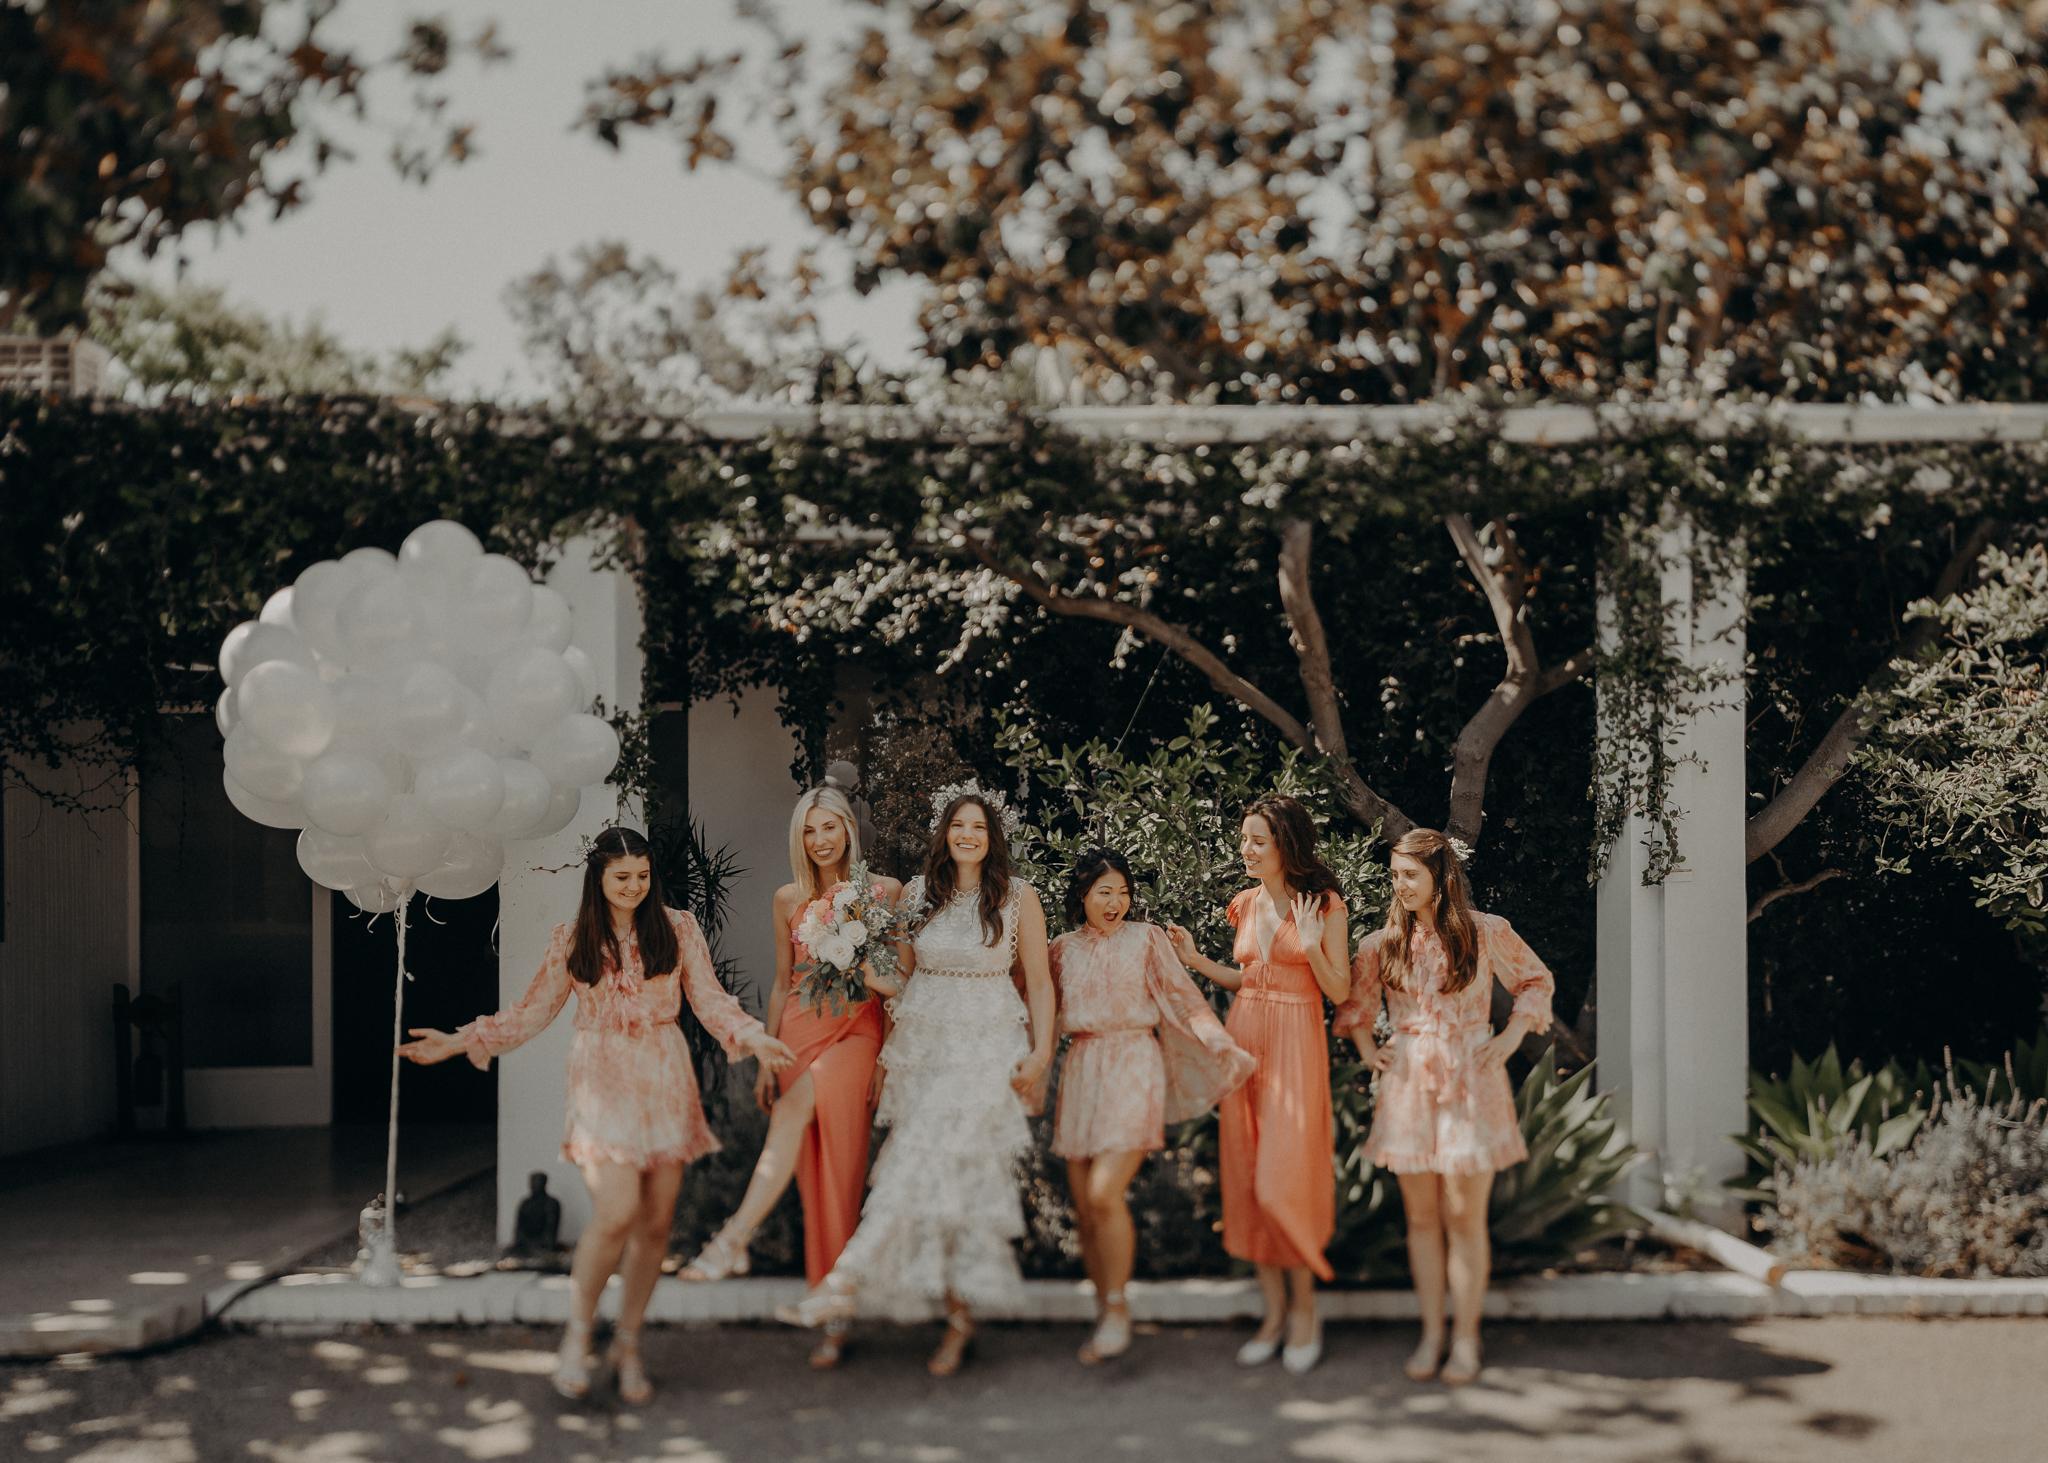 Isaiah + Taylor Photography - Private Estate Backyard Wedding - Beverly Hills - Los Angeles Wedding Photographer - 50.jpg